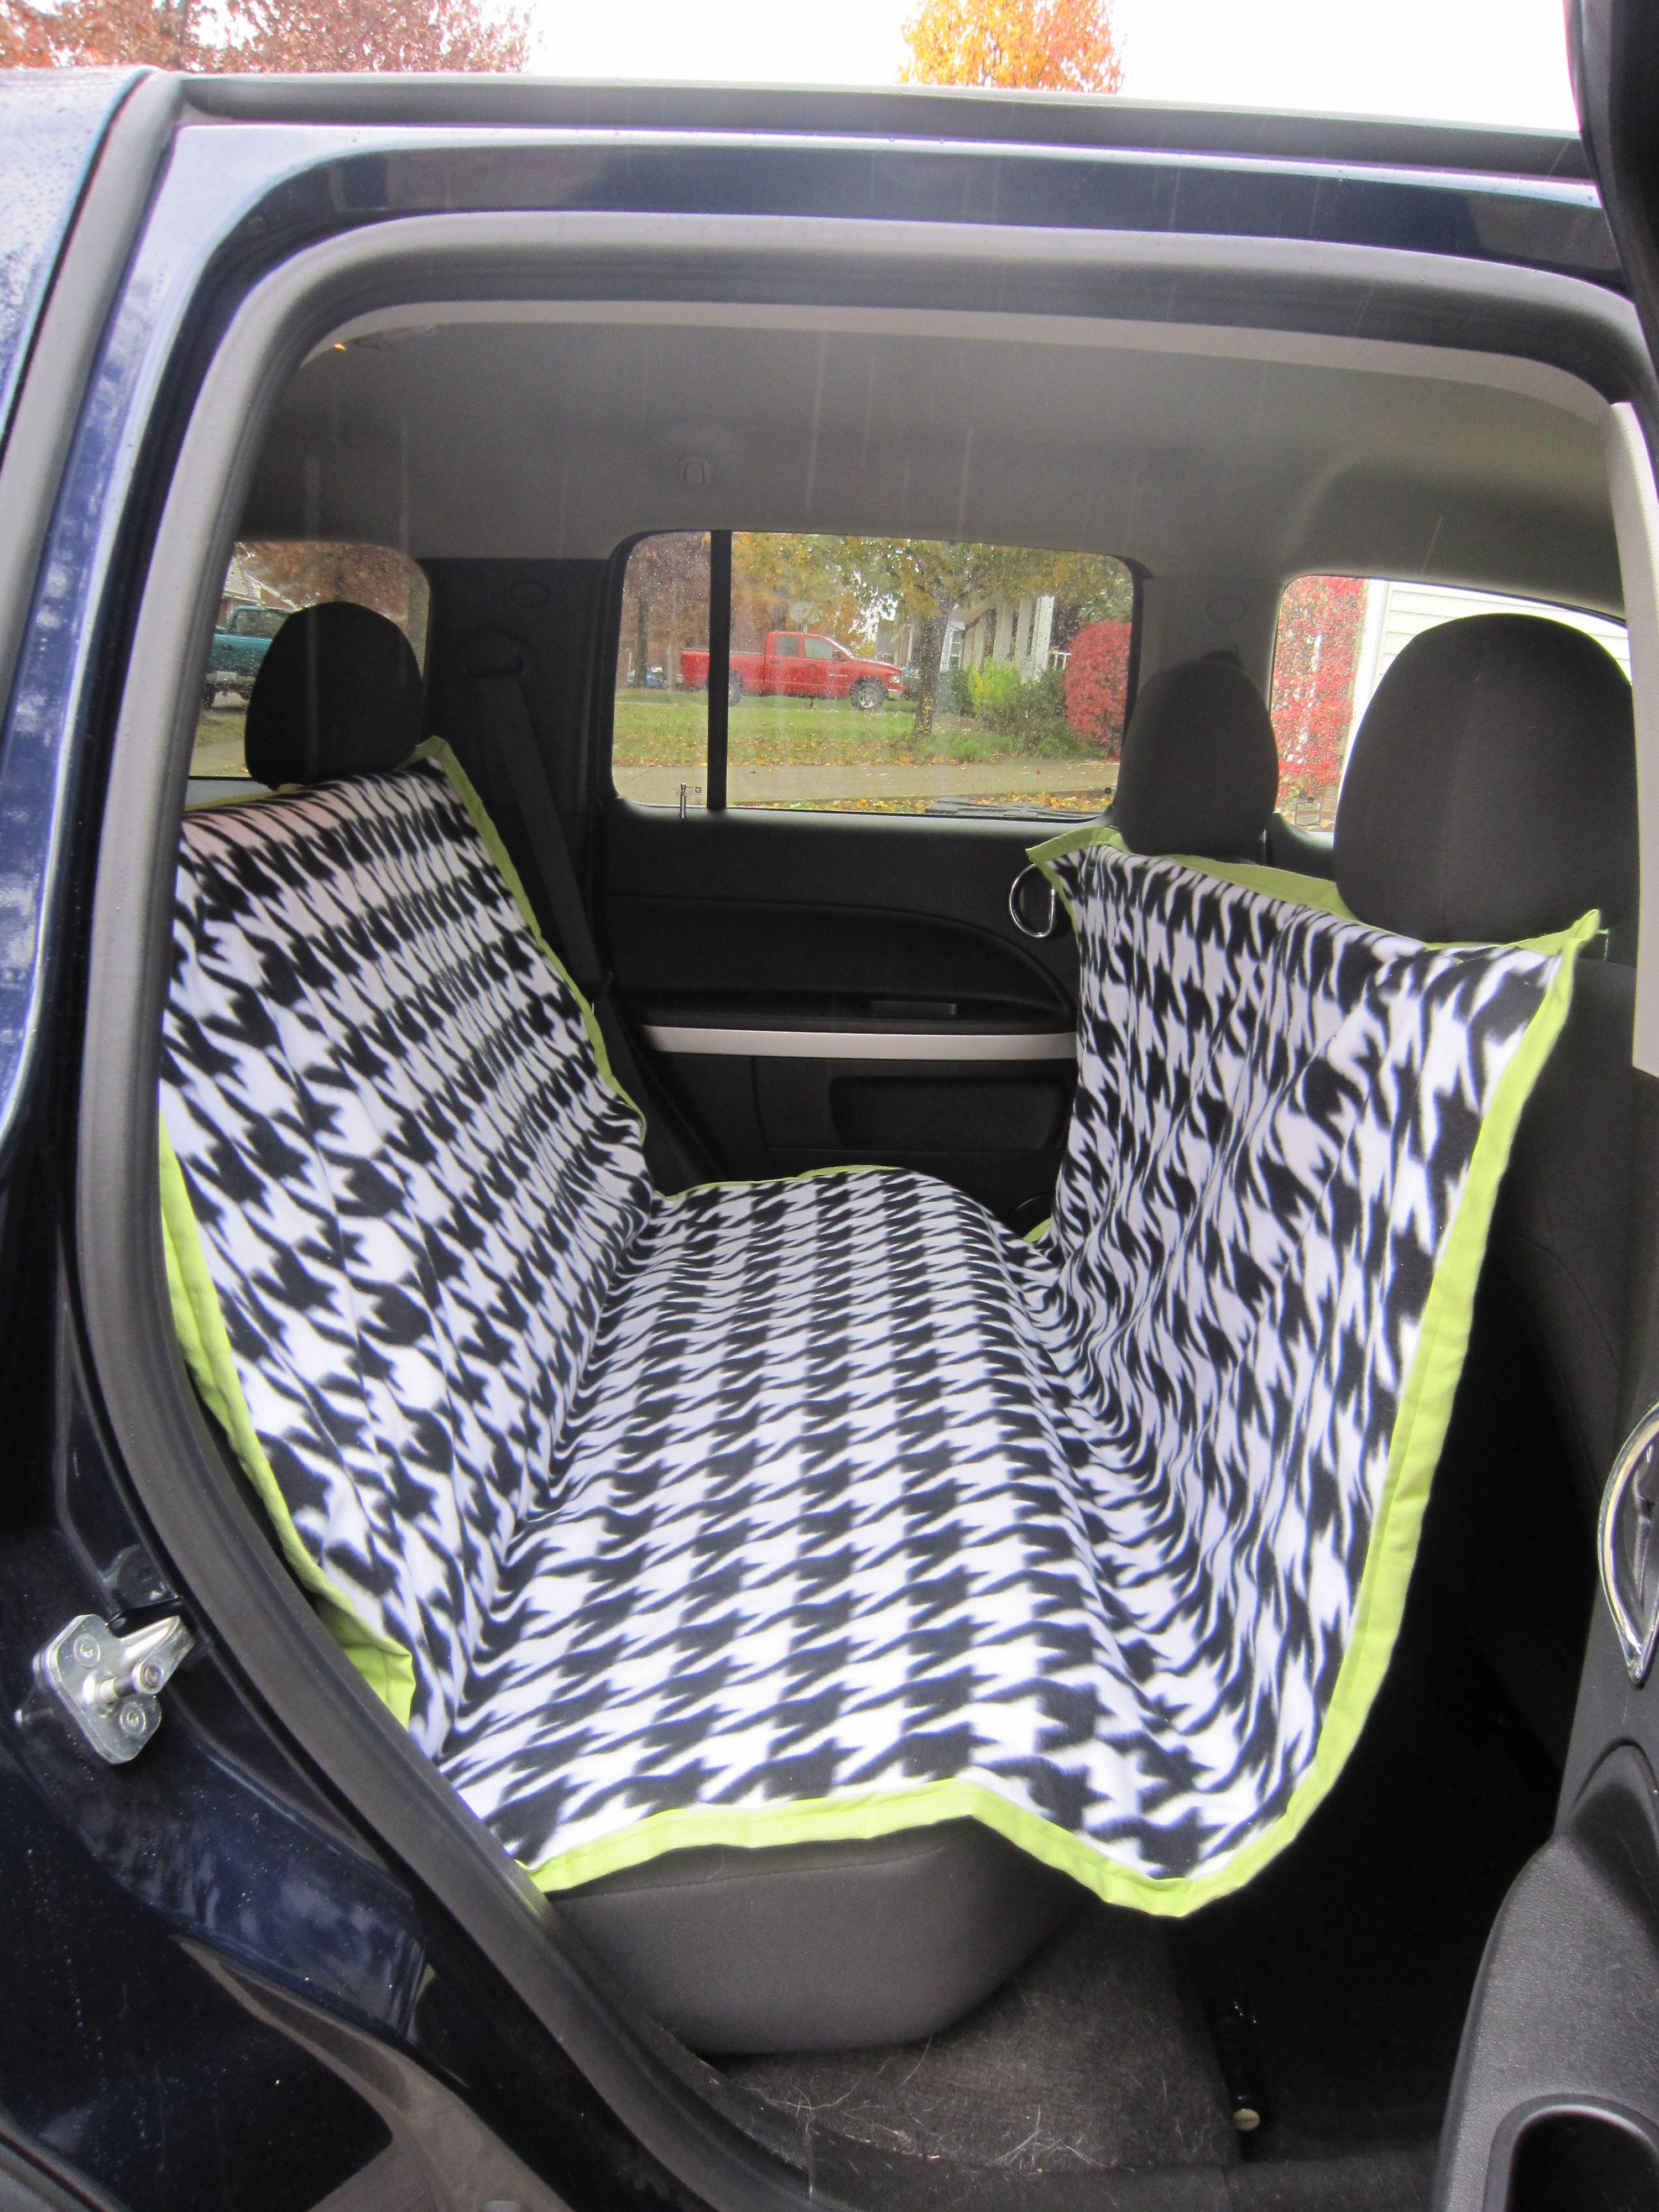 DogCentric Homes Part Deux Diy car seat cover, Dog